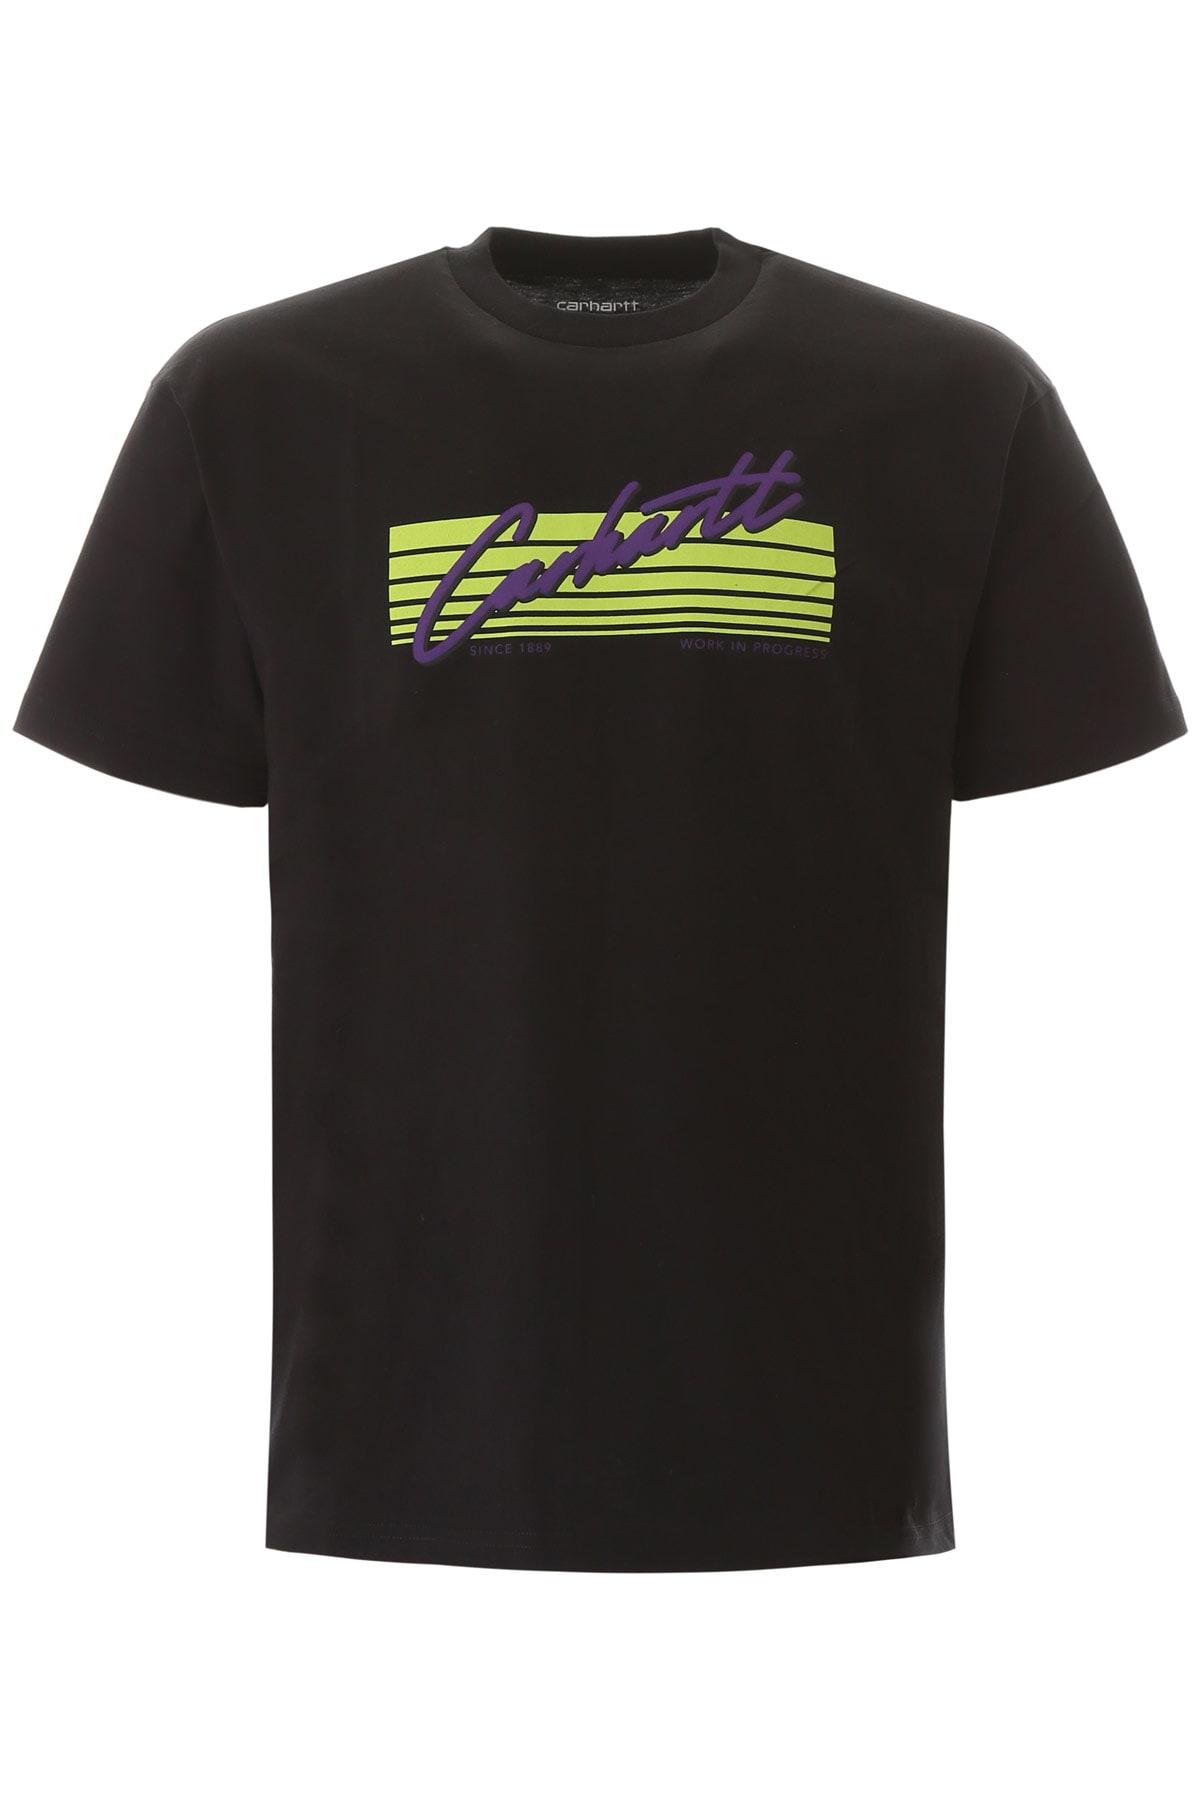 Carhartt Horizon T-shirt